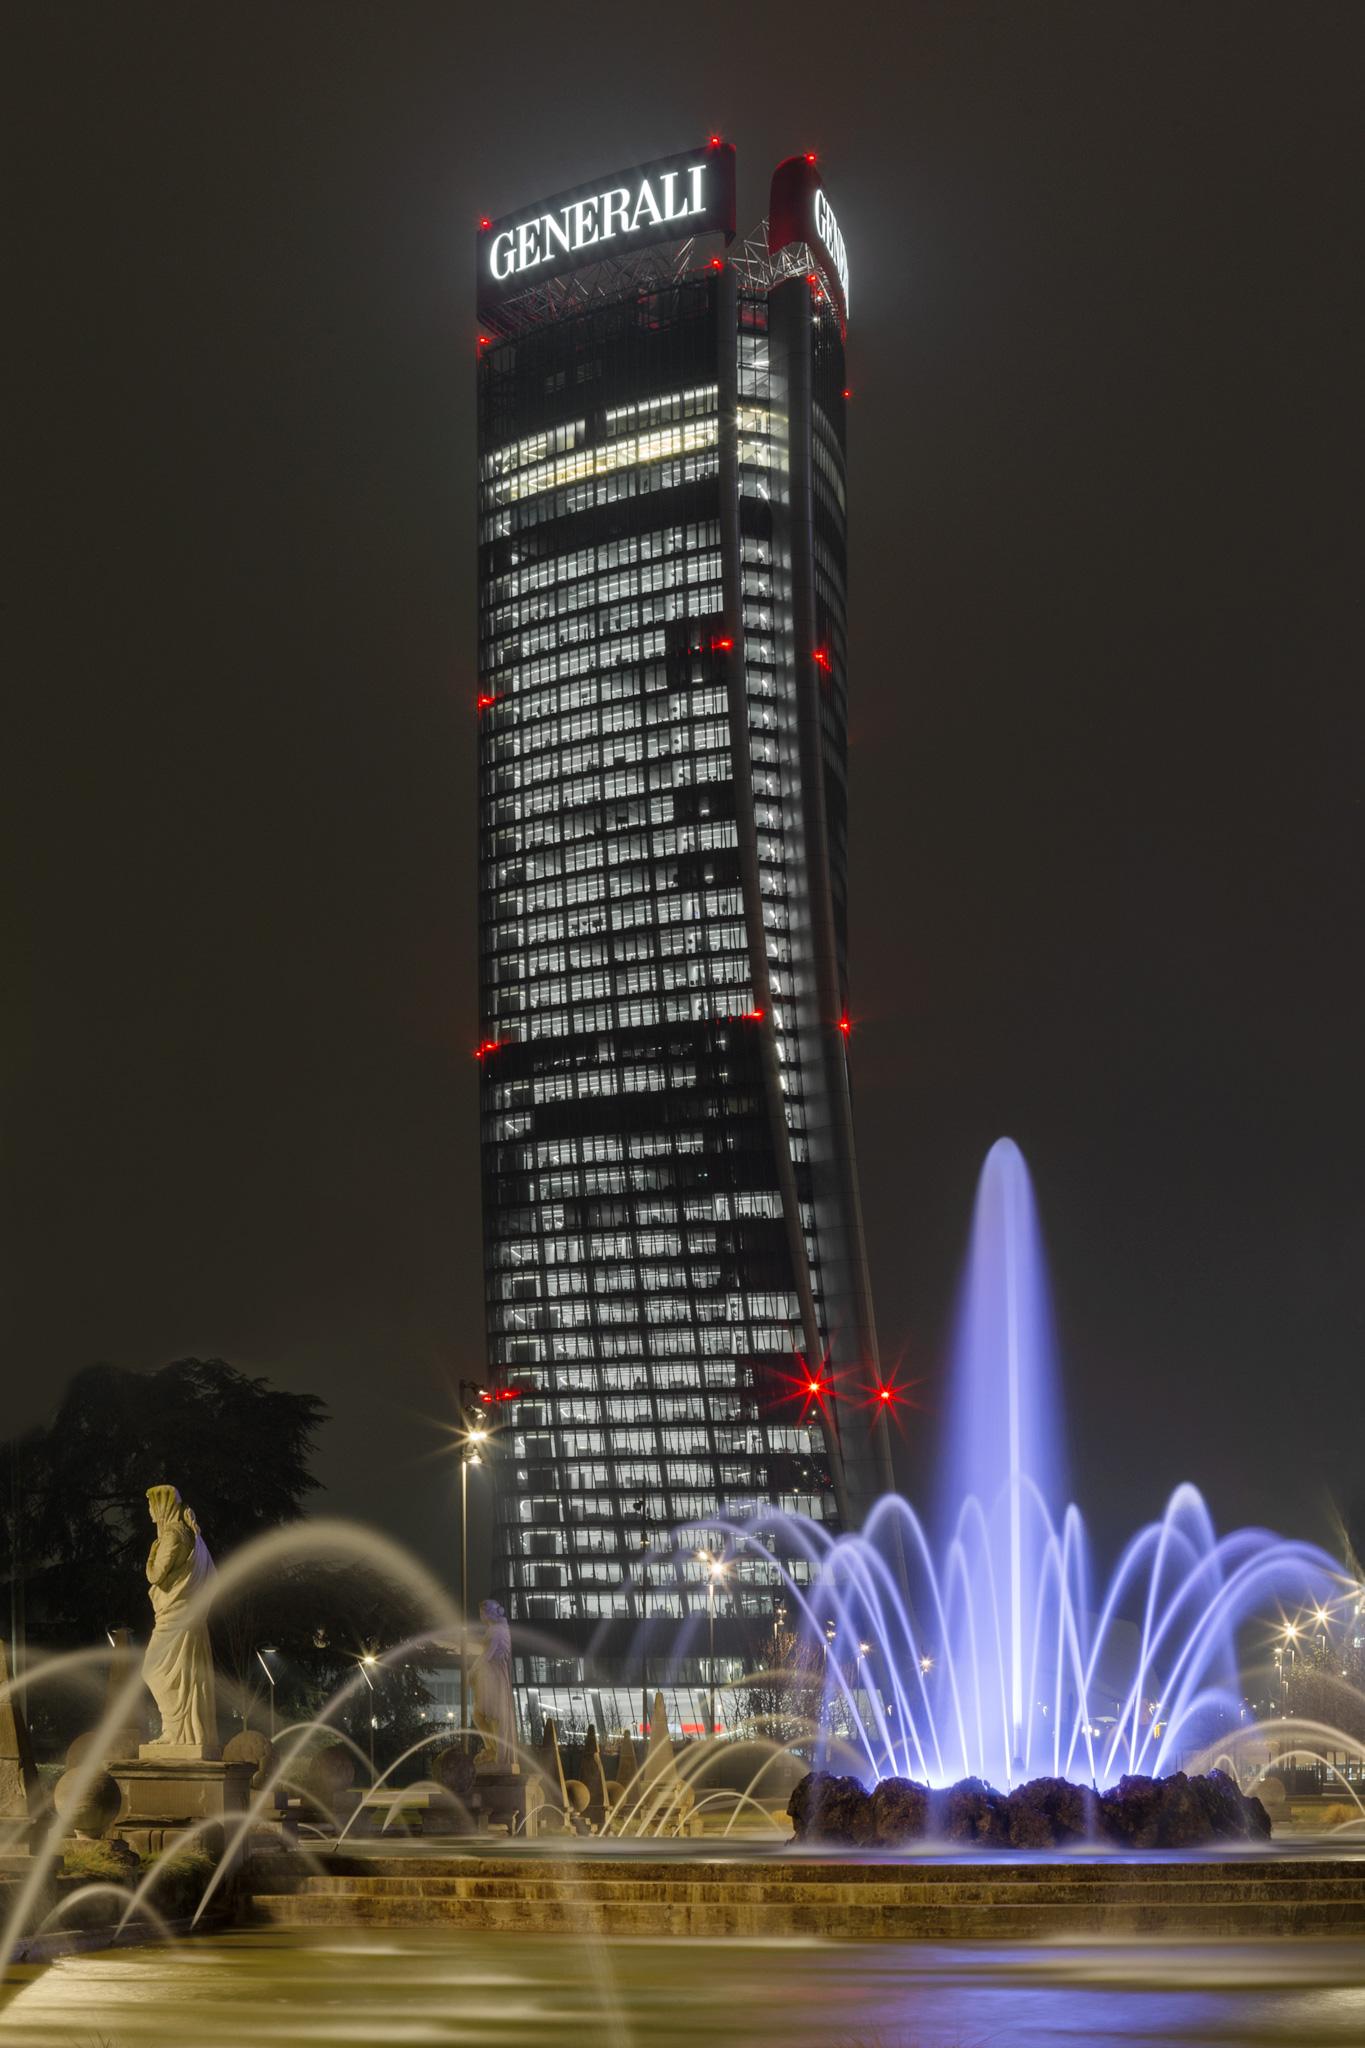 Torre Generali (Hadid). ©2019 Alessandro Businaro